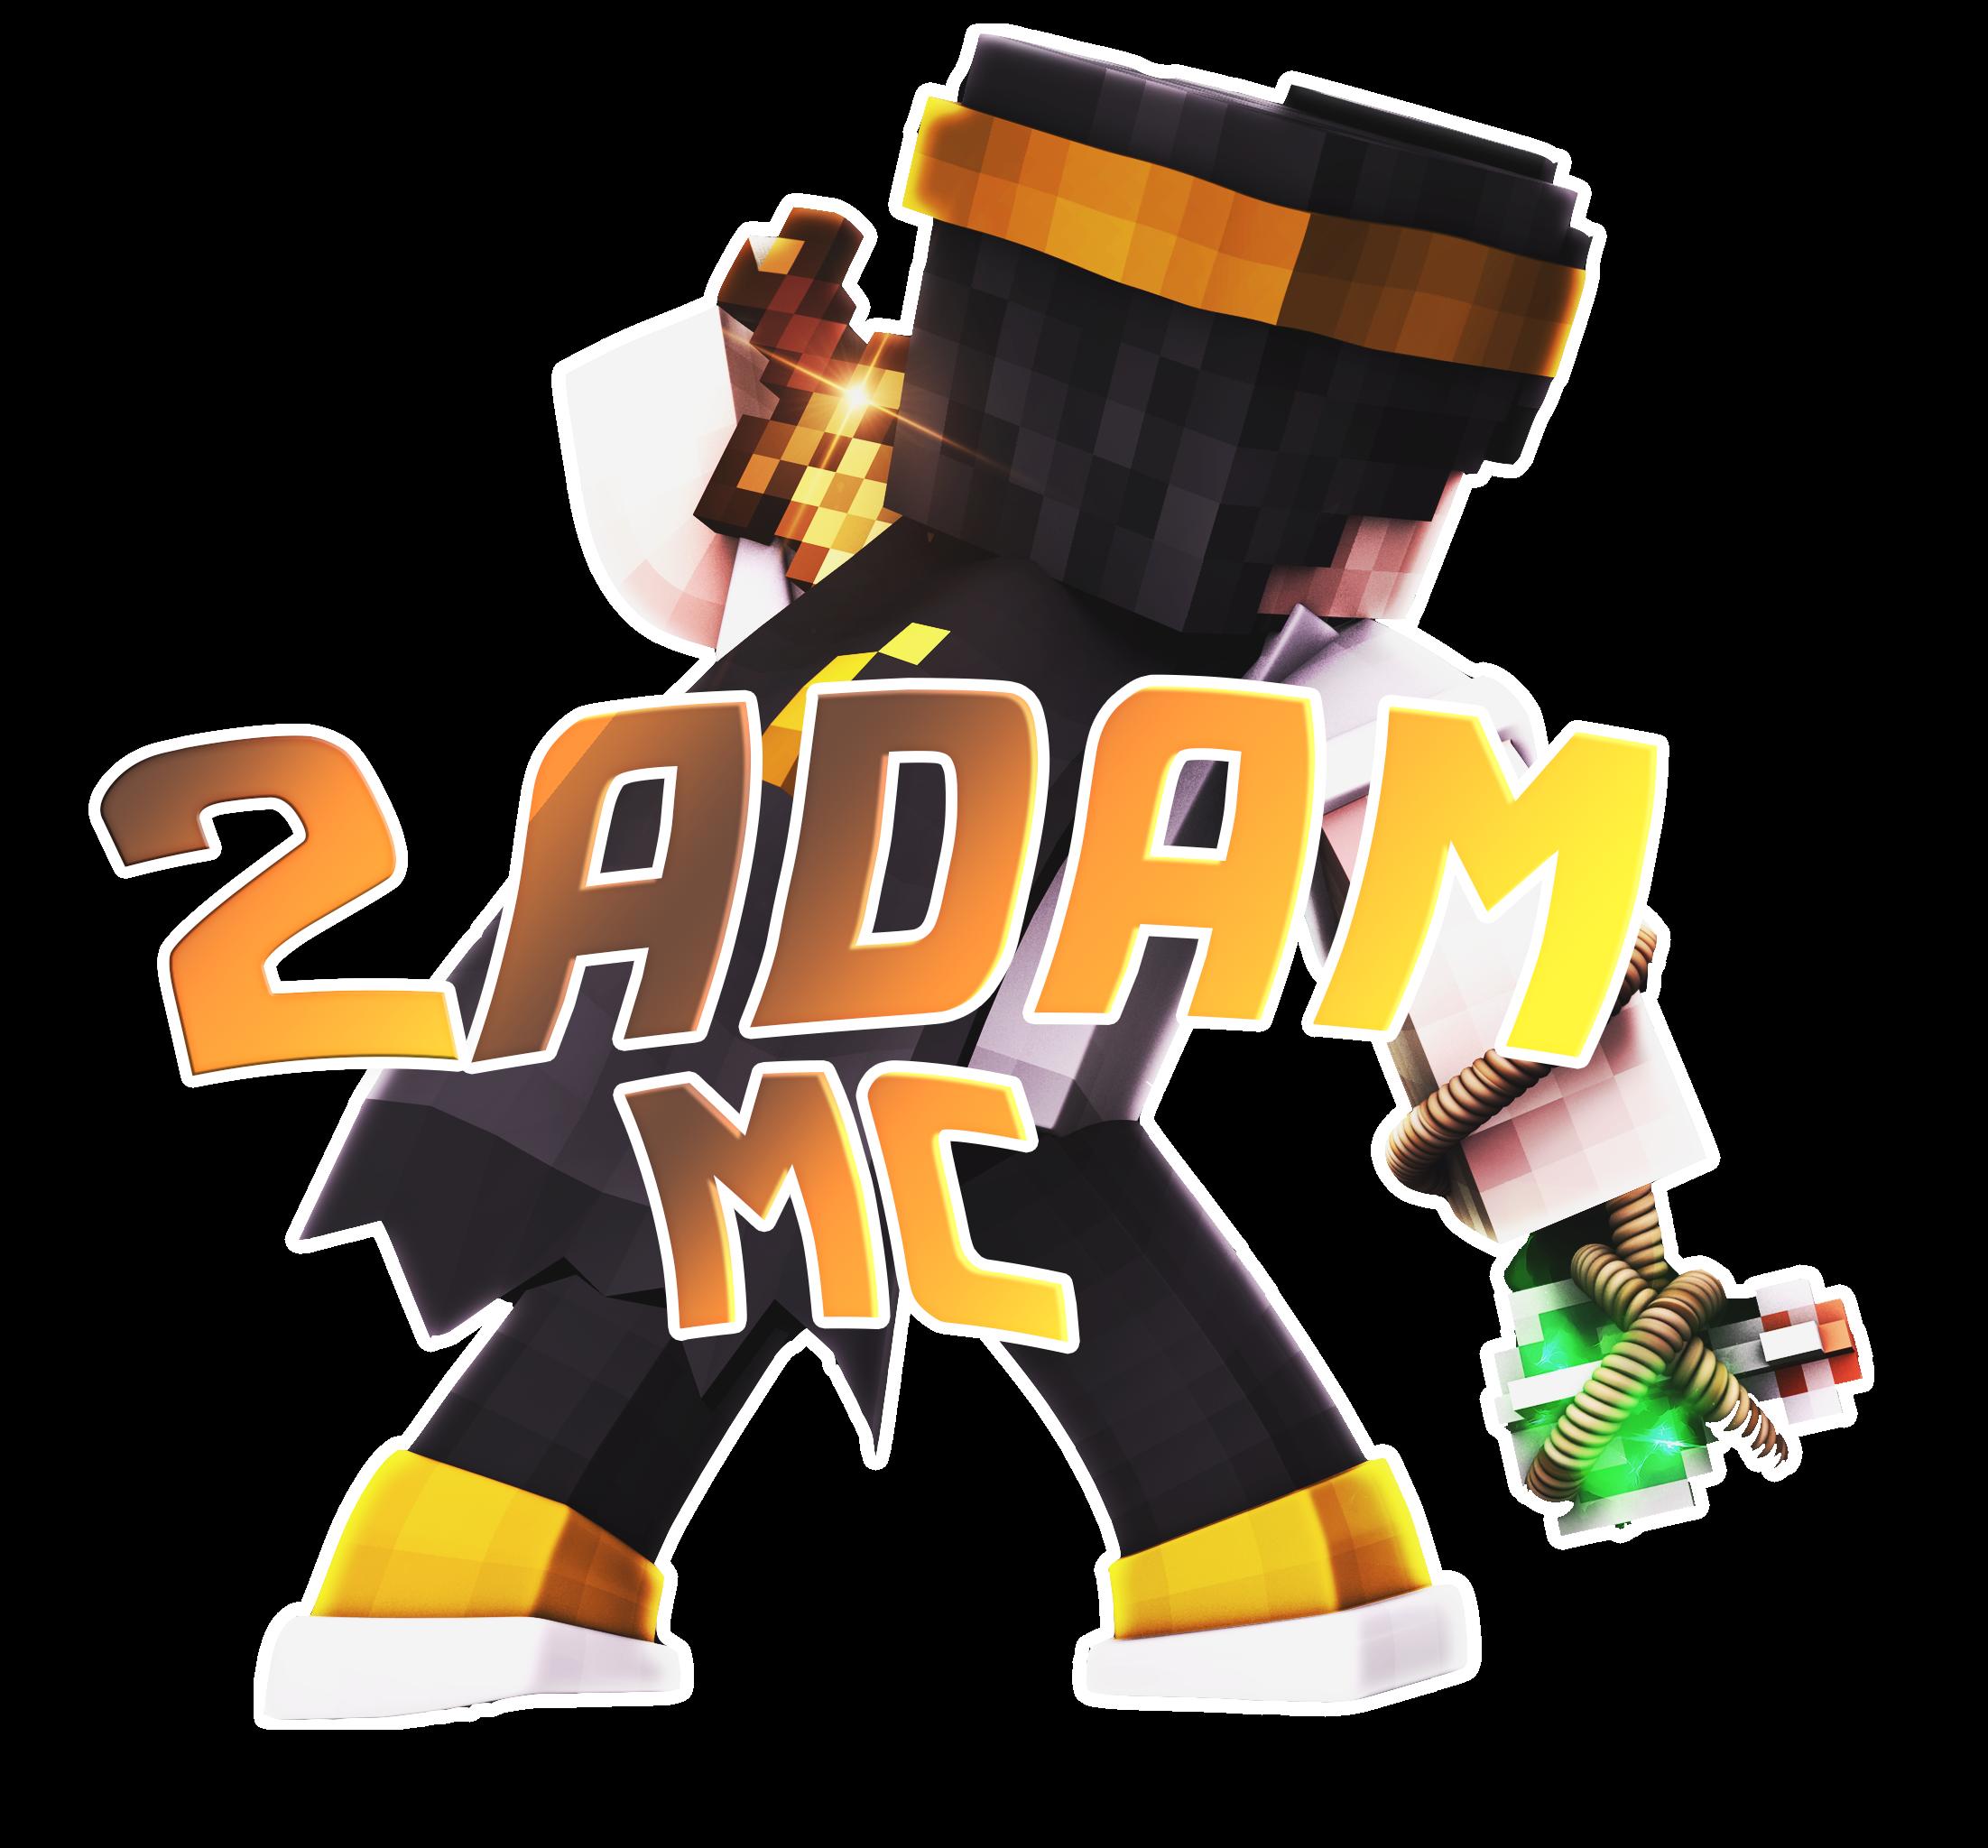 2AdamMC